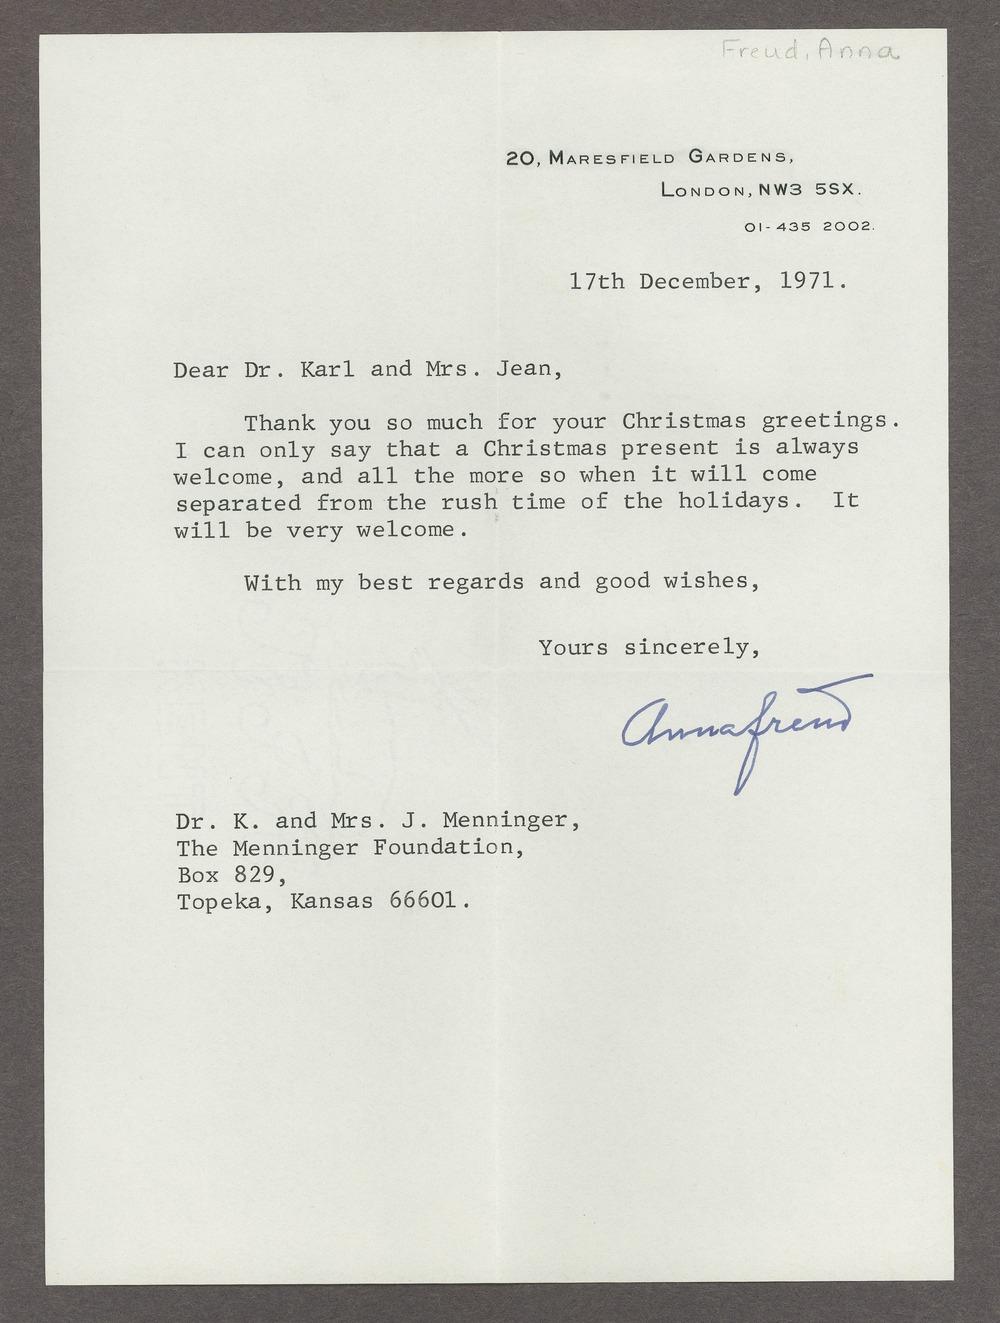 Anna Freud correspondence - Freud, Anna  December 17, 1971 (Box 1, folder 49)